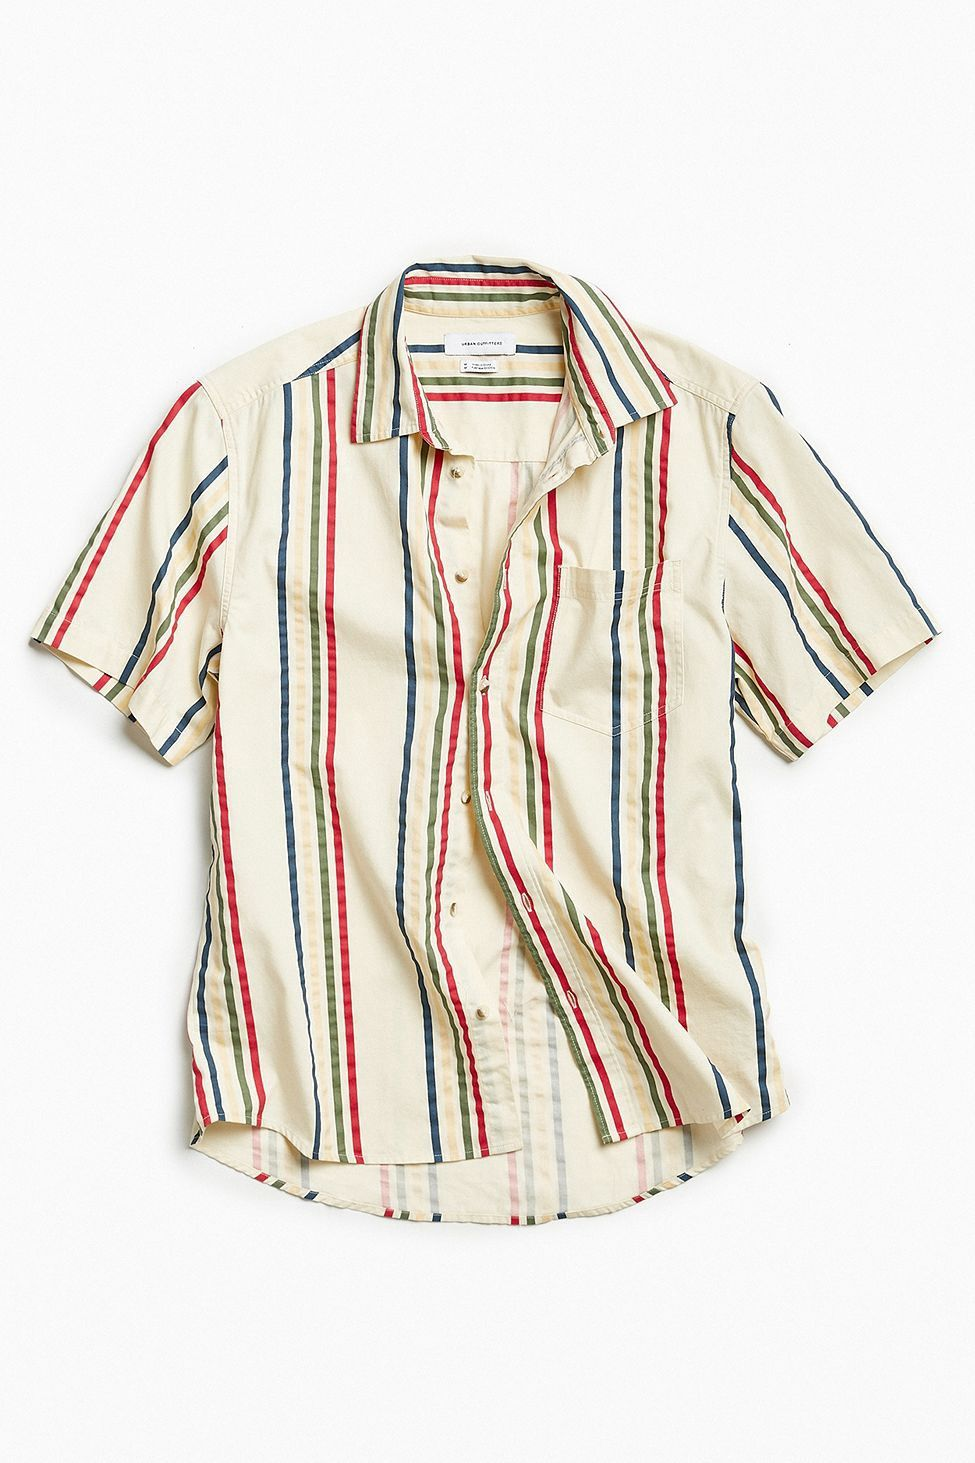 b72b0ae388 Urban Outfitters Uo '90S Vertical Stripe Short Sleeve Button-Down Shirt -  Dark Green Xs